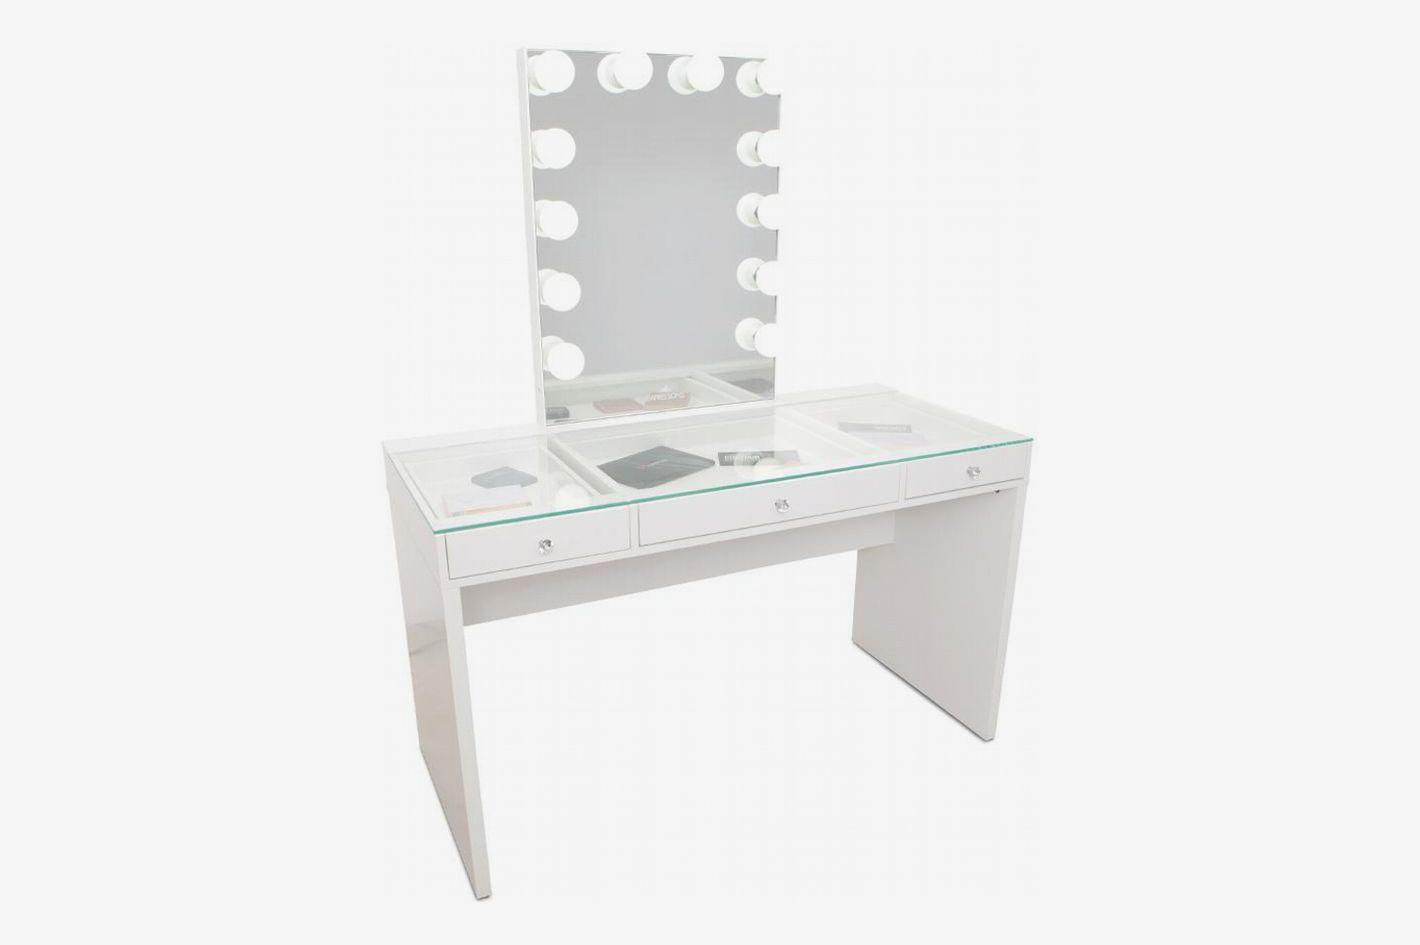 d5dcacac4c44 Impressions Slaystation Plus 2.0 Table + Glow XL Vanity Mirror Bundle